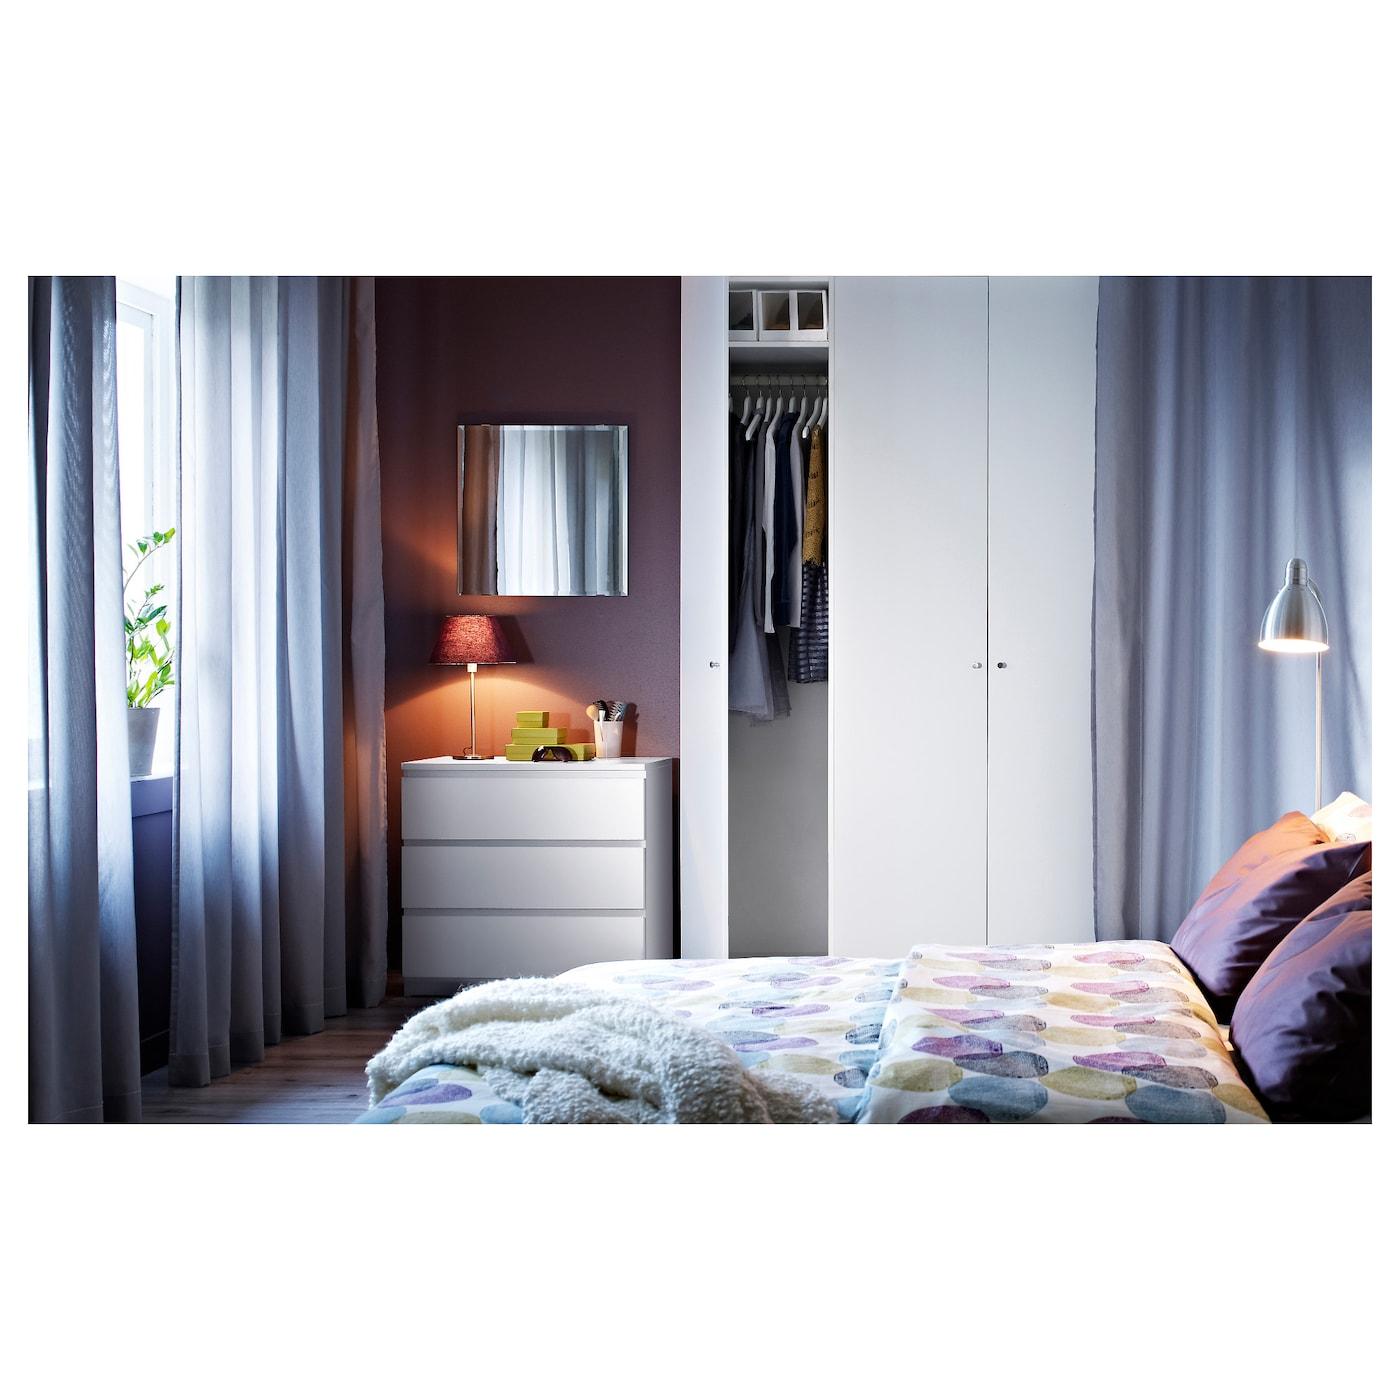 malm commode 3 tiroirs blanc 80 x 78 cm ikea. Black Bedroom Furniture Sets. Home Design Ideas